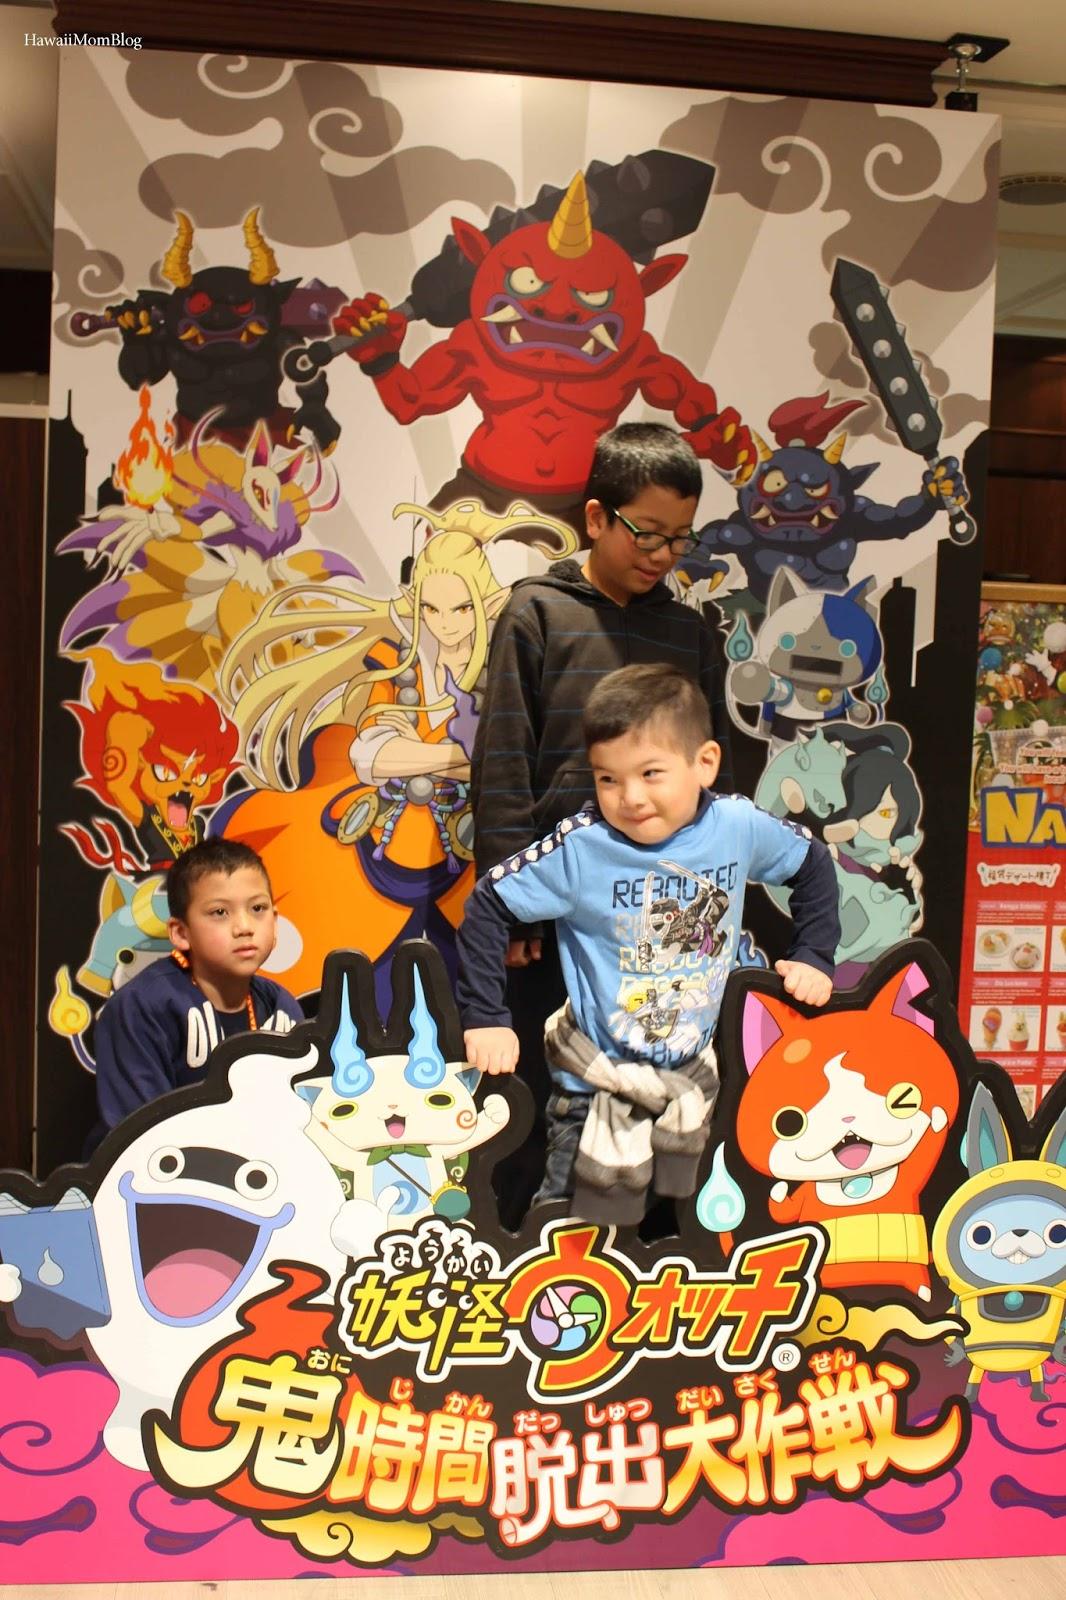 Hawaii Mom Blog: Visit Tokyo: NamjaTown